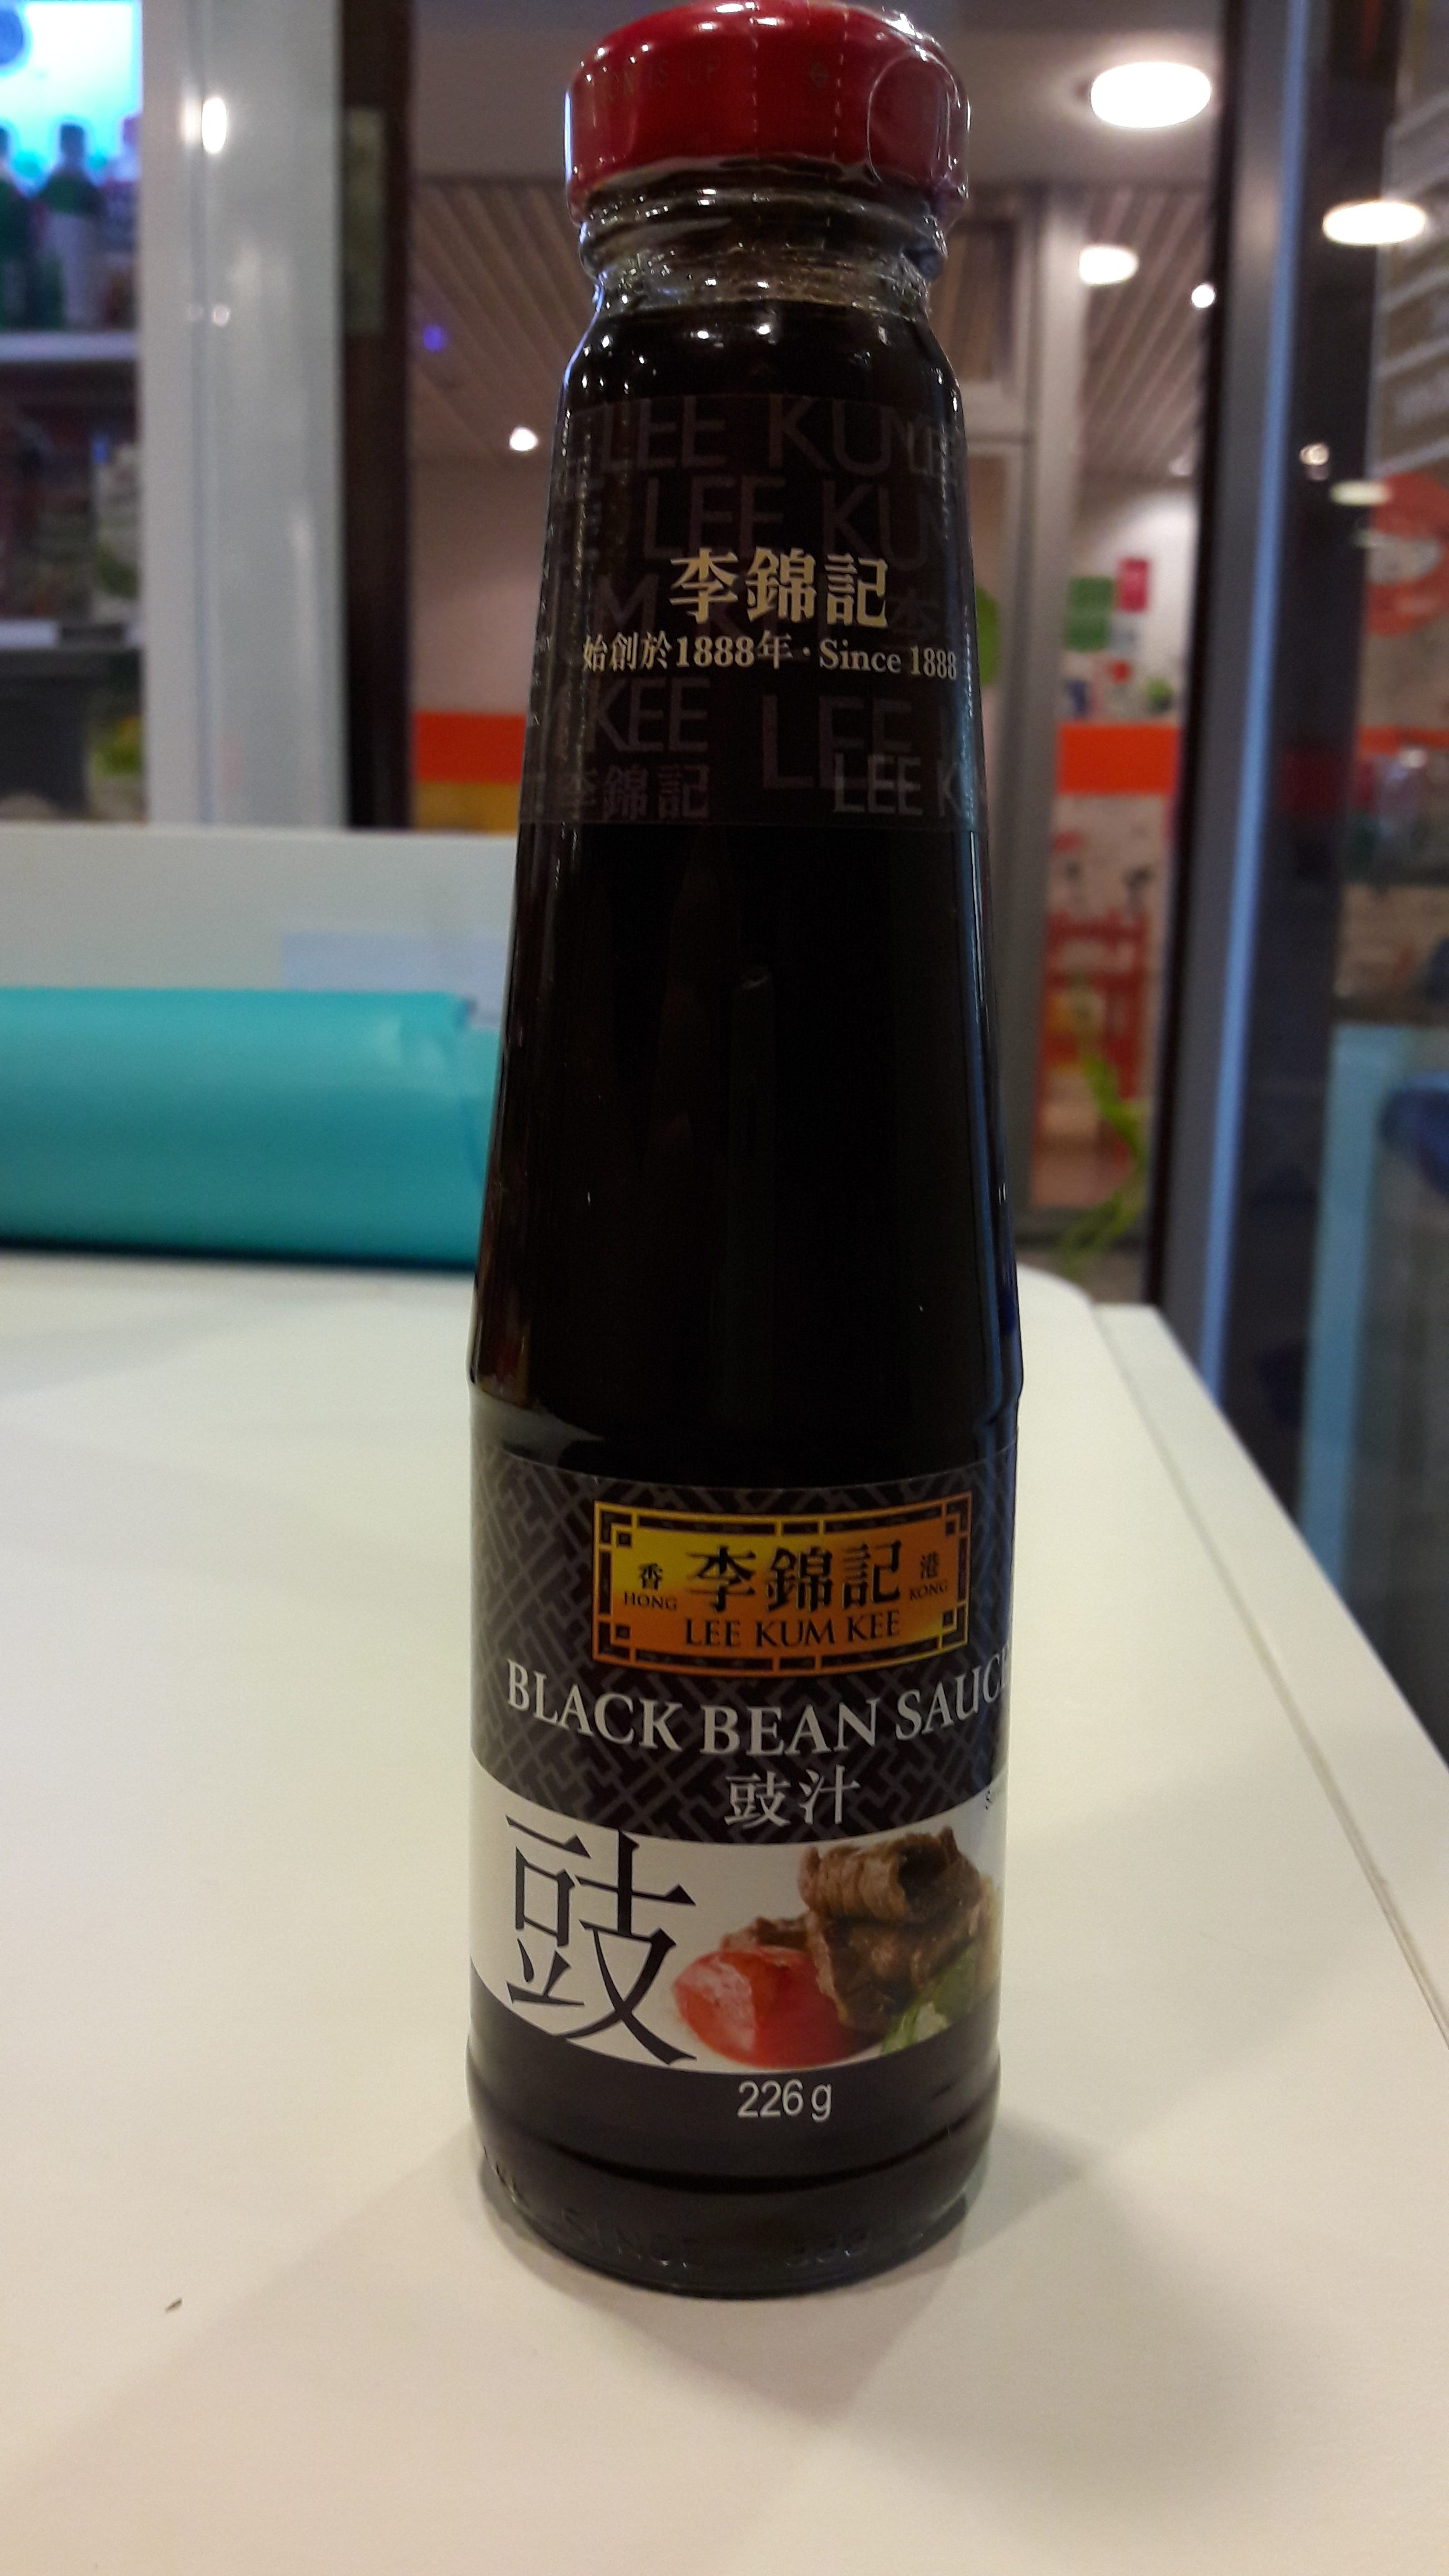 Sauce aux haricots noirs - Black Bean Sauce - 226g. - Lee Kum Kee(grand) Image